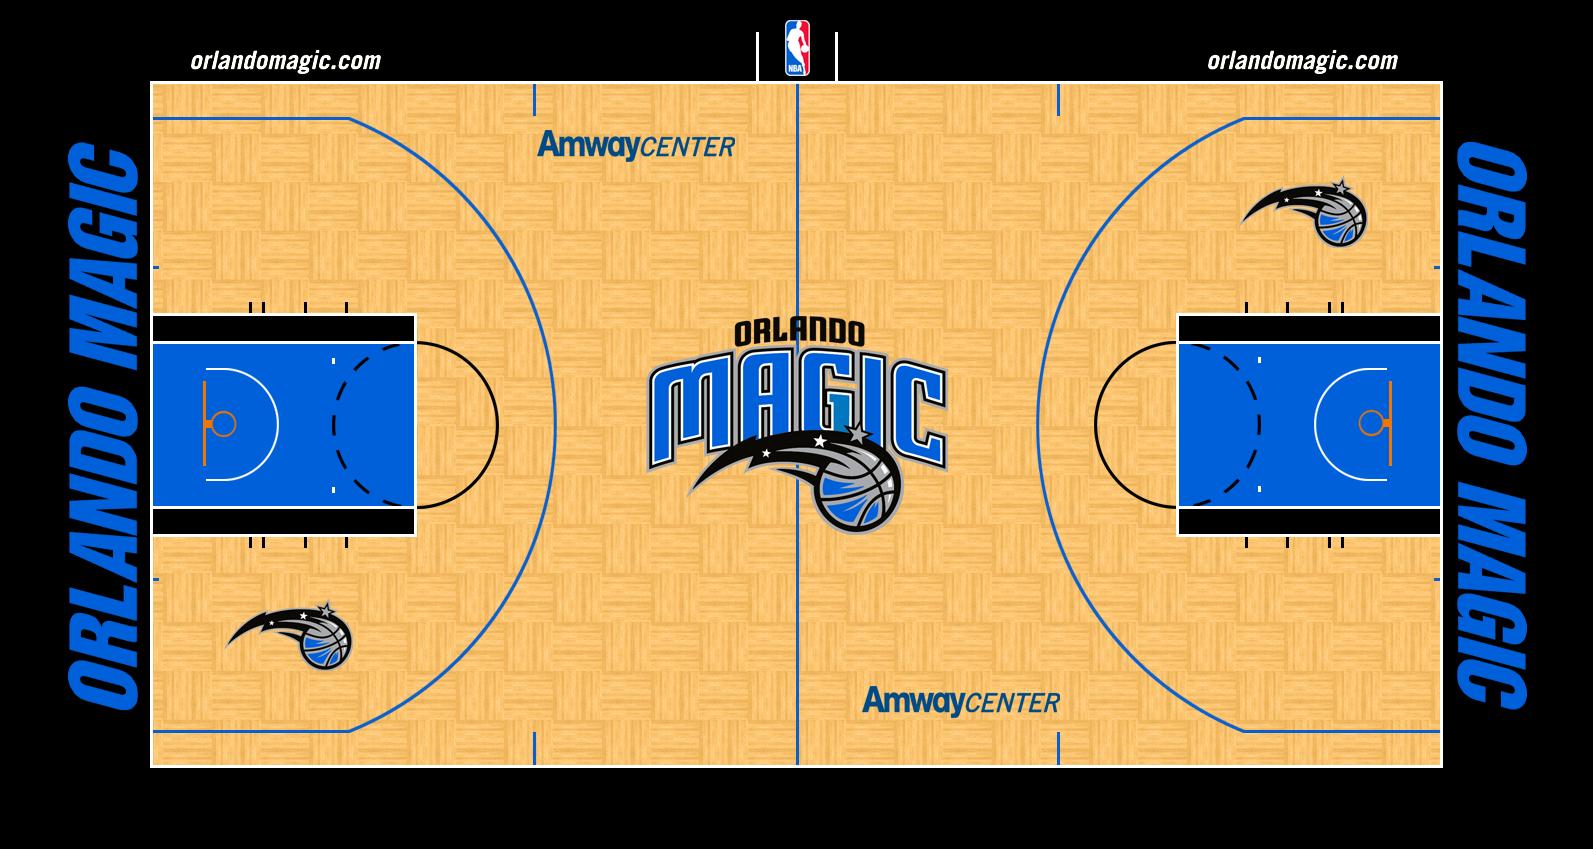 Nba Logos 2017 >> Orlando Magic Stadium Logo - National Basketball Association (NBA) - Chris Creamer's Sports ...